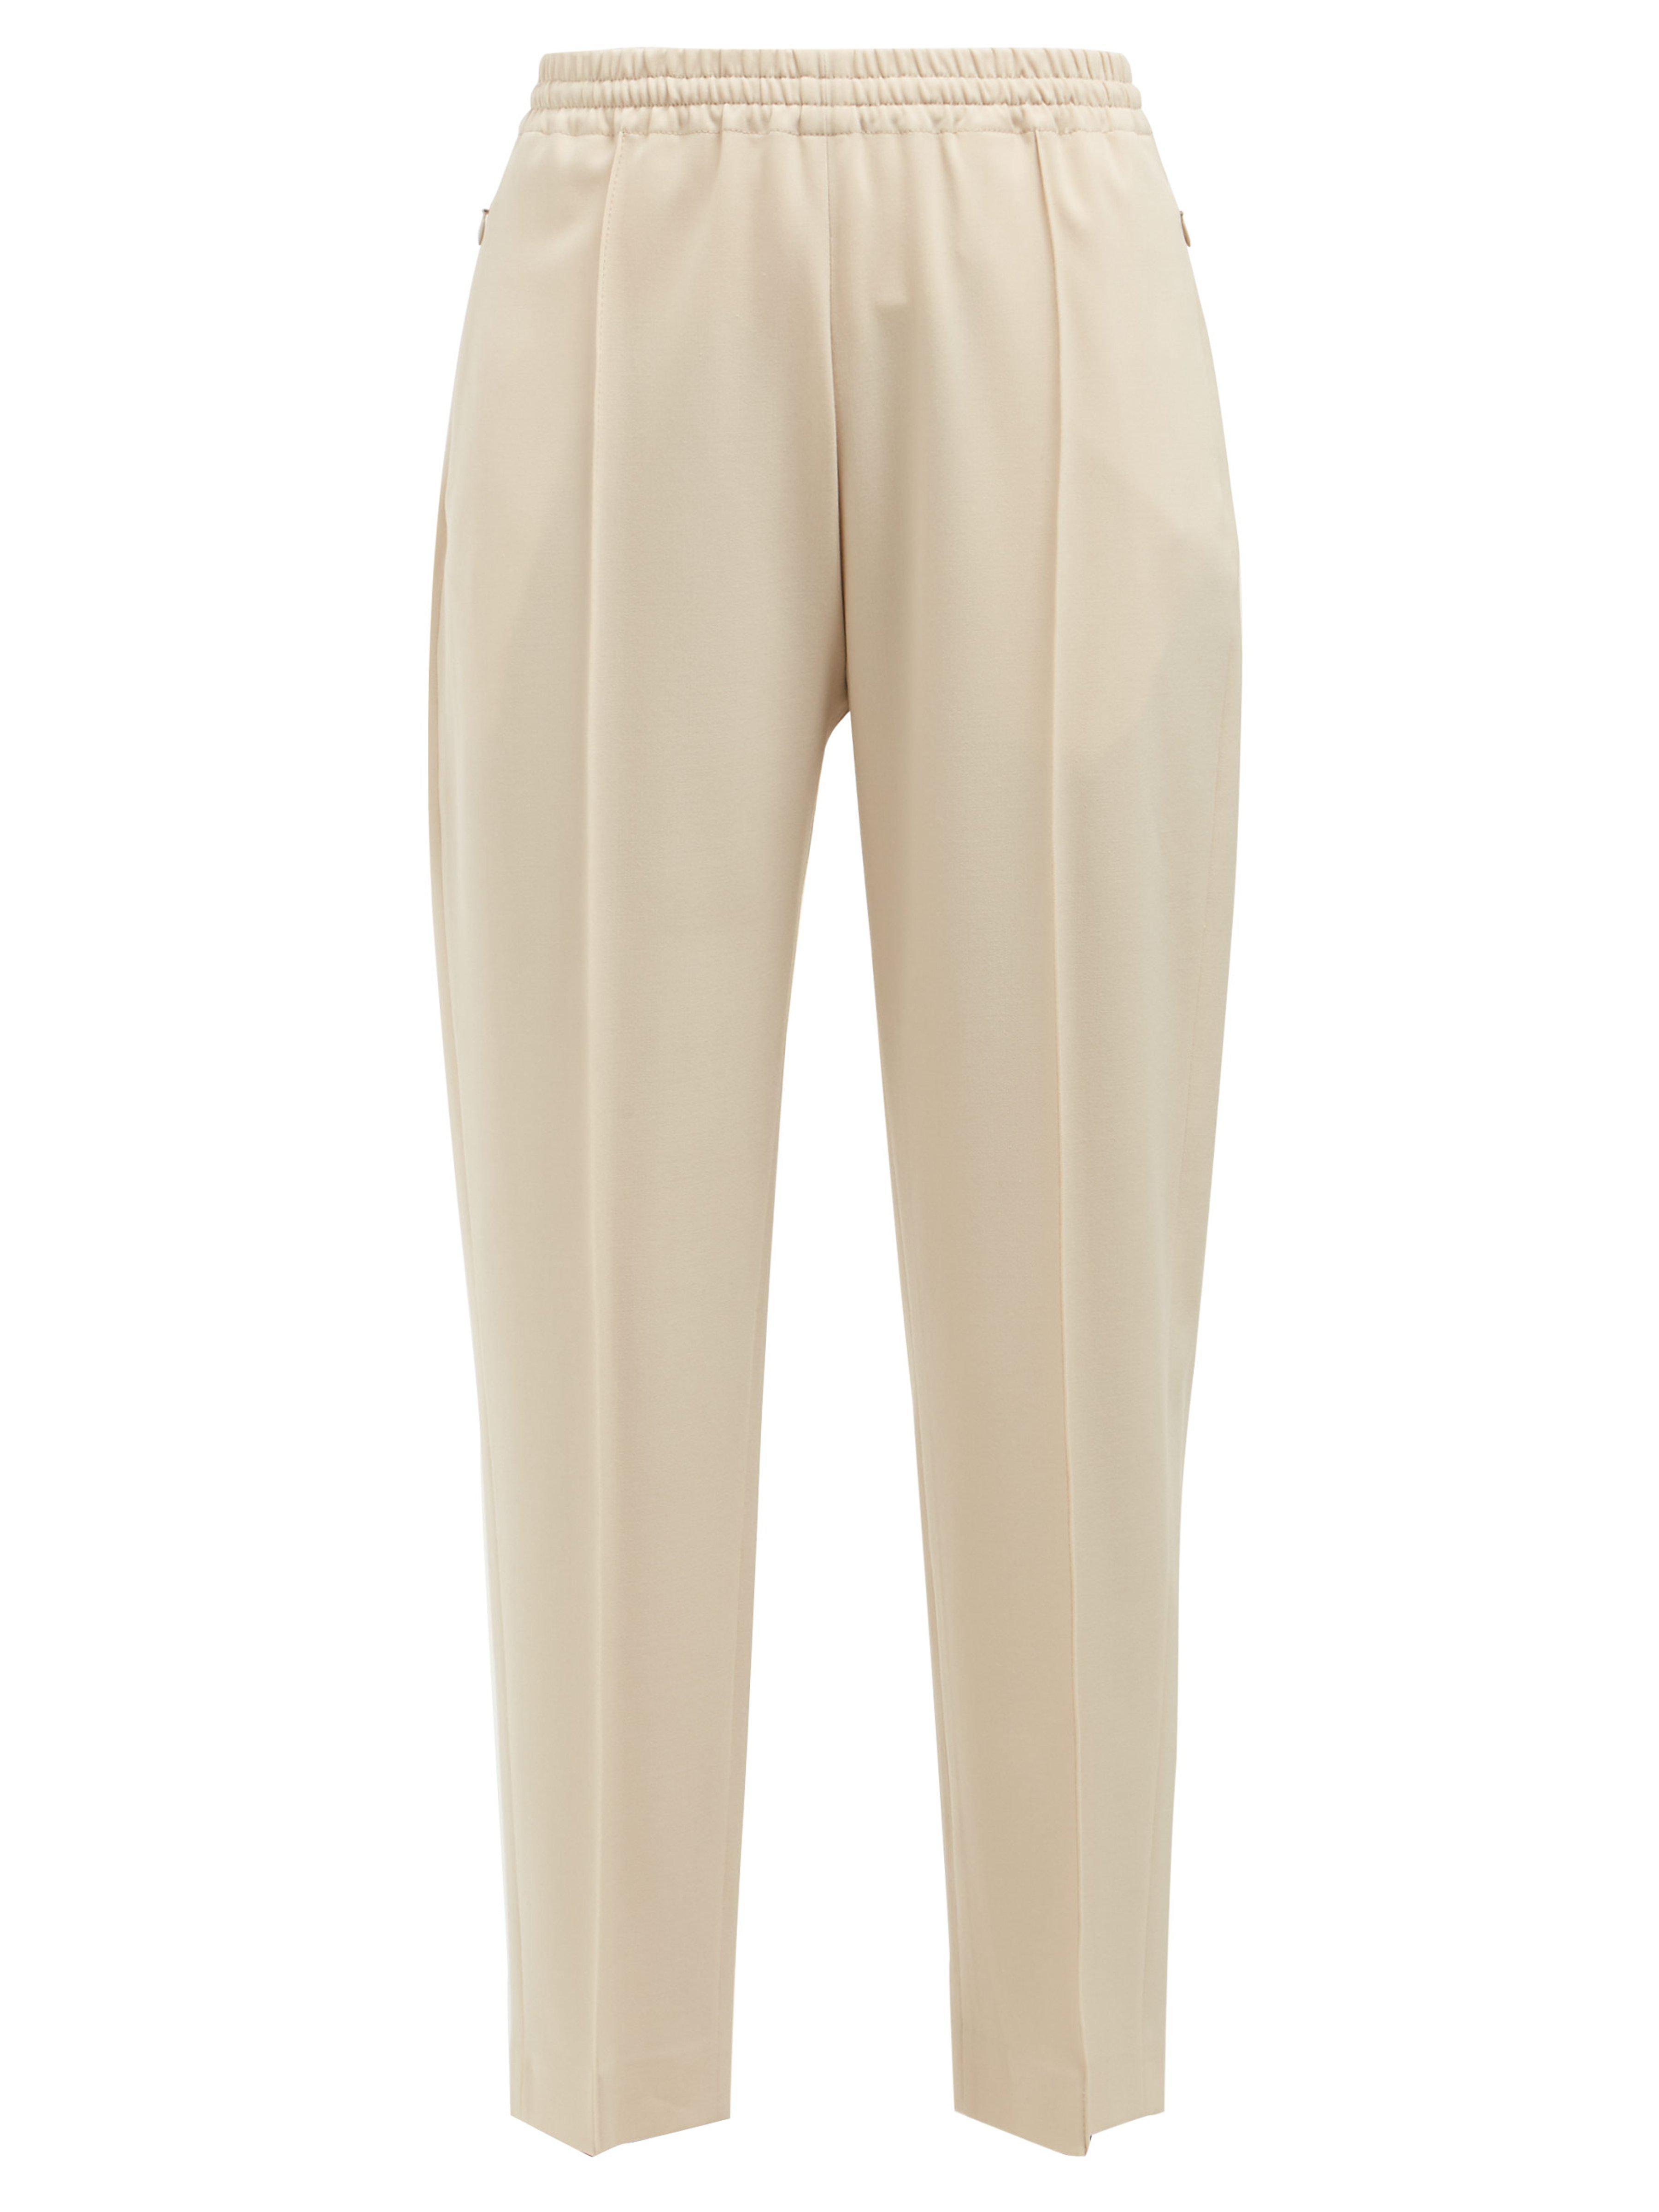 4c68f487a06 JOSEPH Dalton Wool Blend Trousers in Natural - Lyst